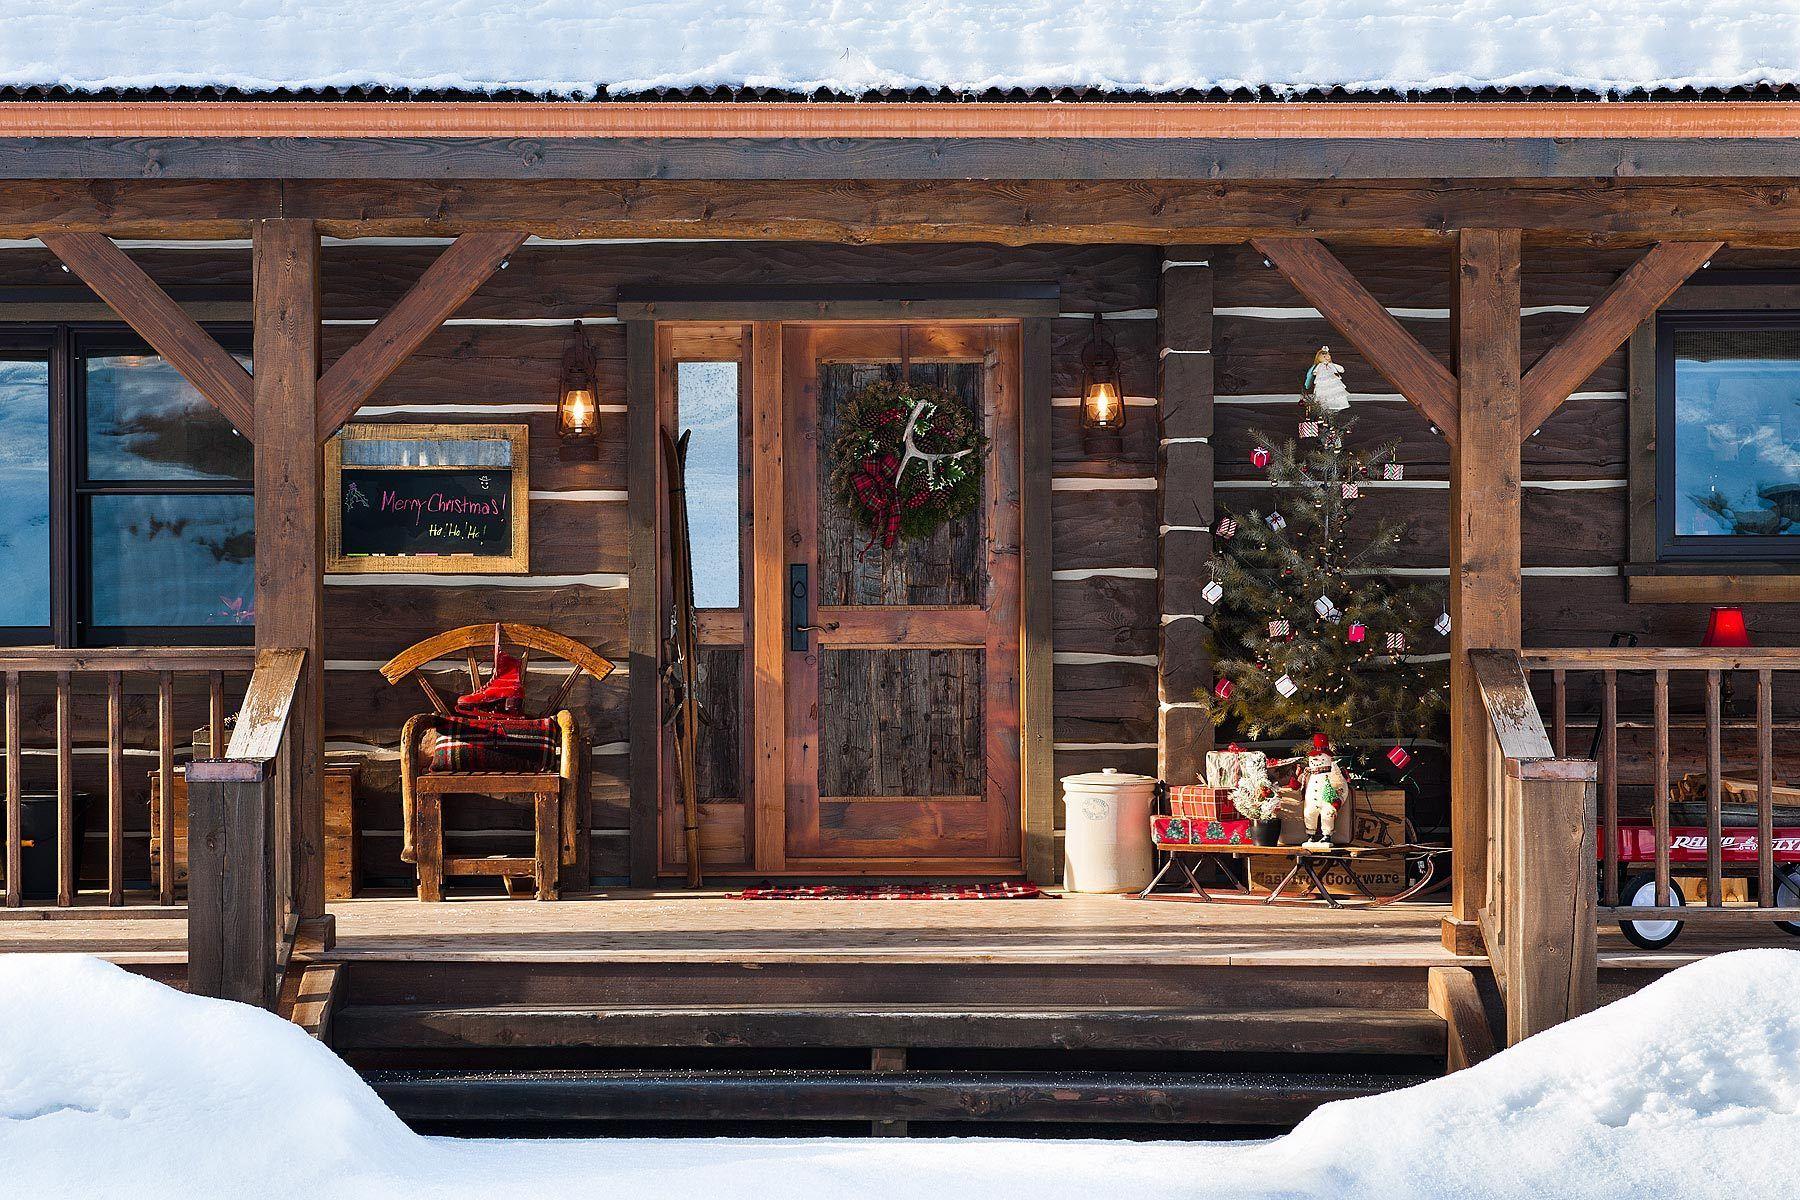 Winter Porch, Whitefish, MT